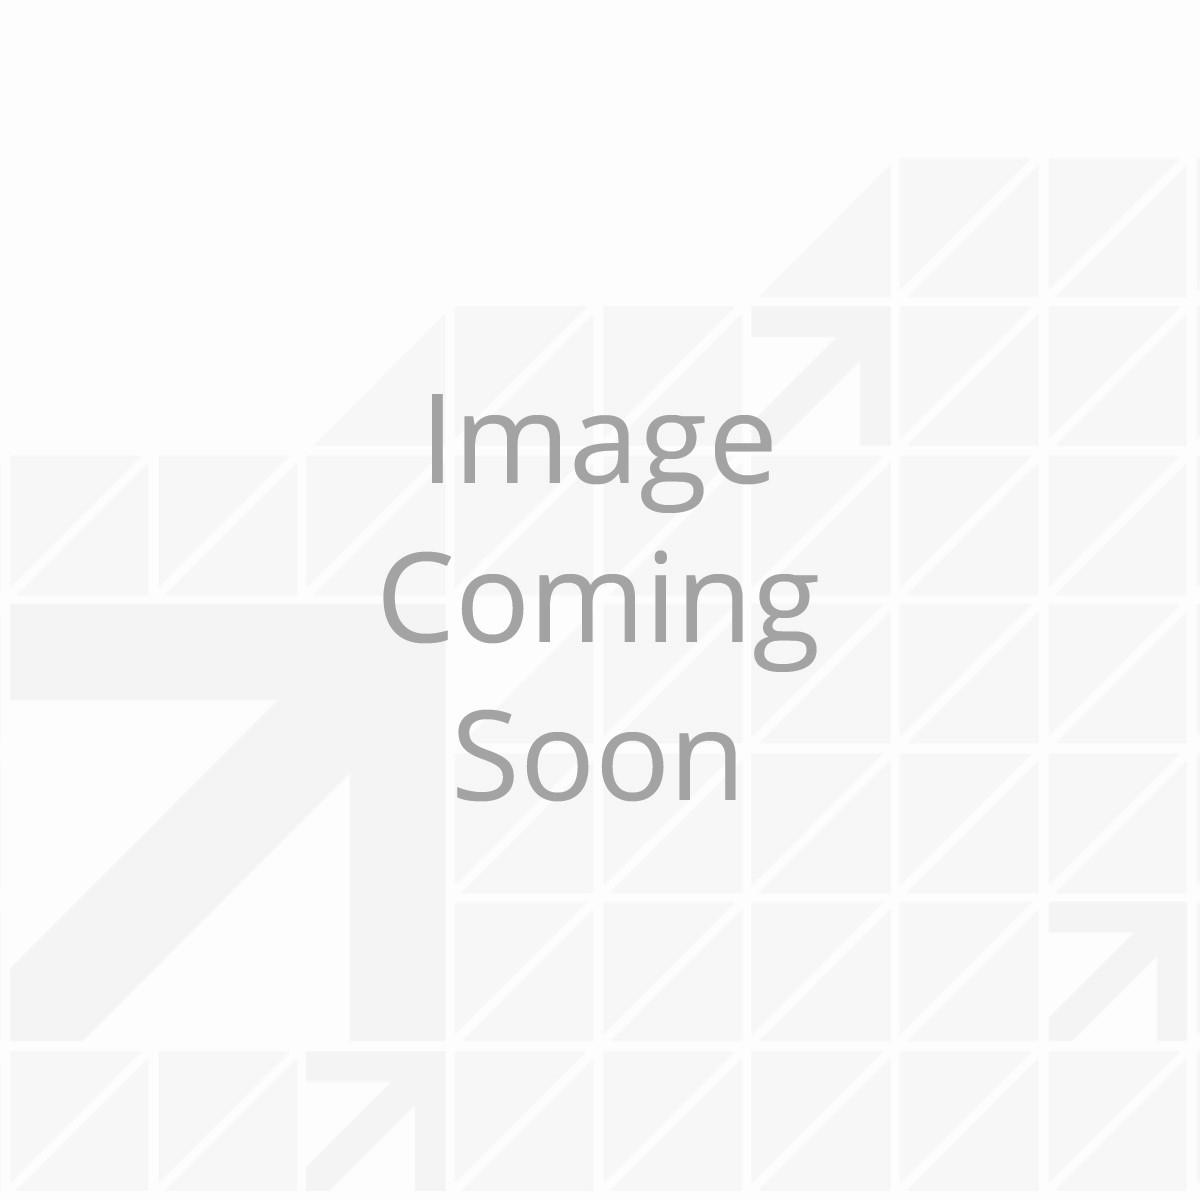 239491 - Tandem Axle Ap Kit - 001